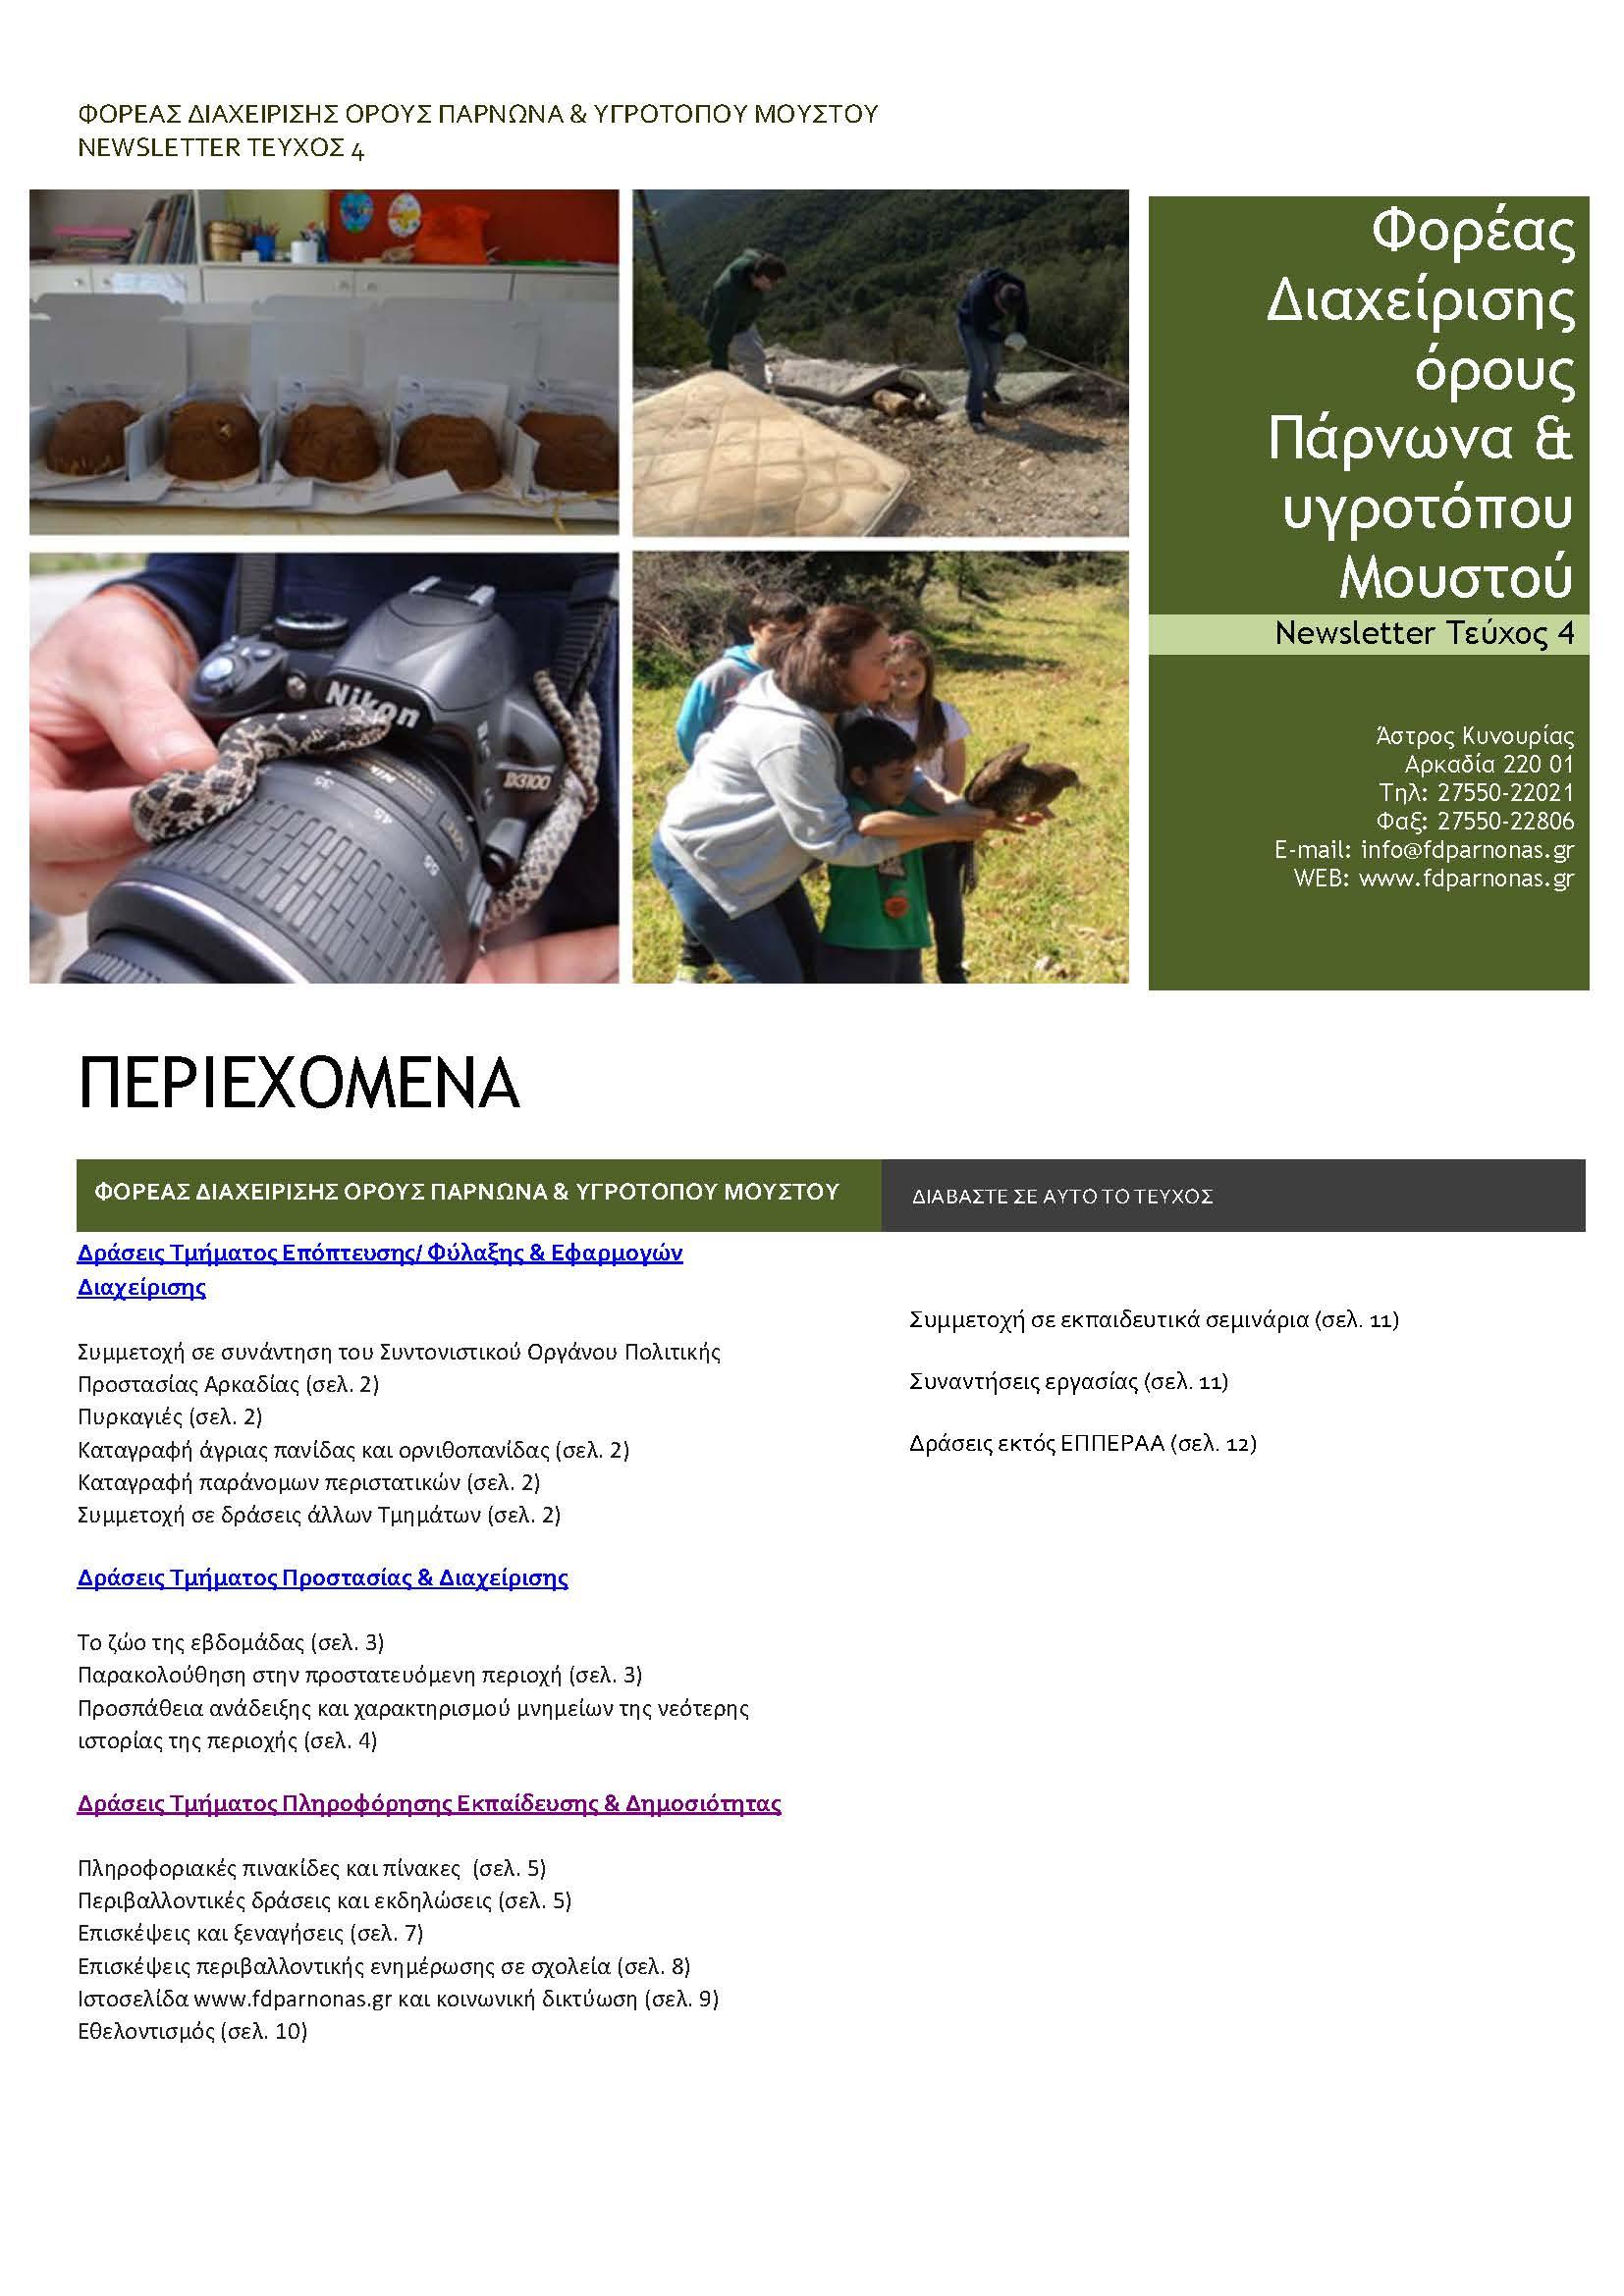 news_a_14 1.jpg